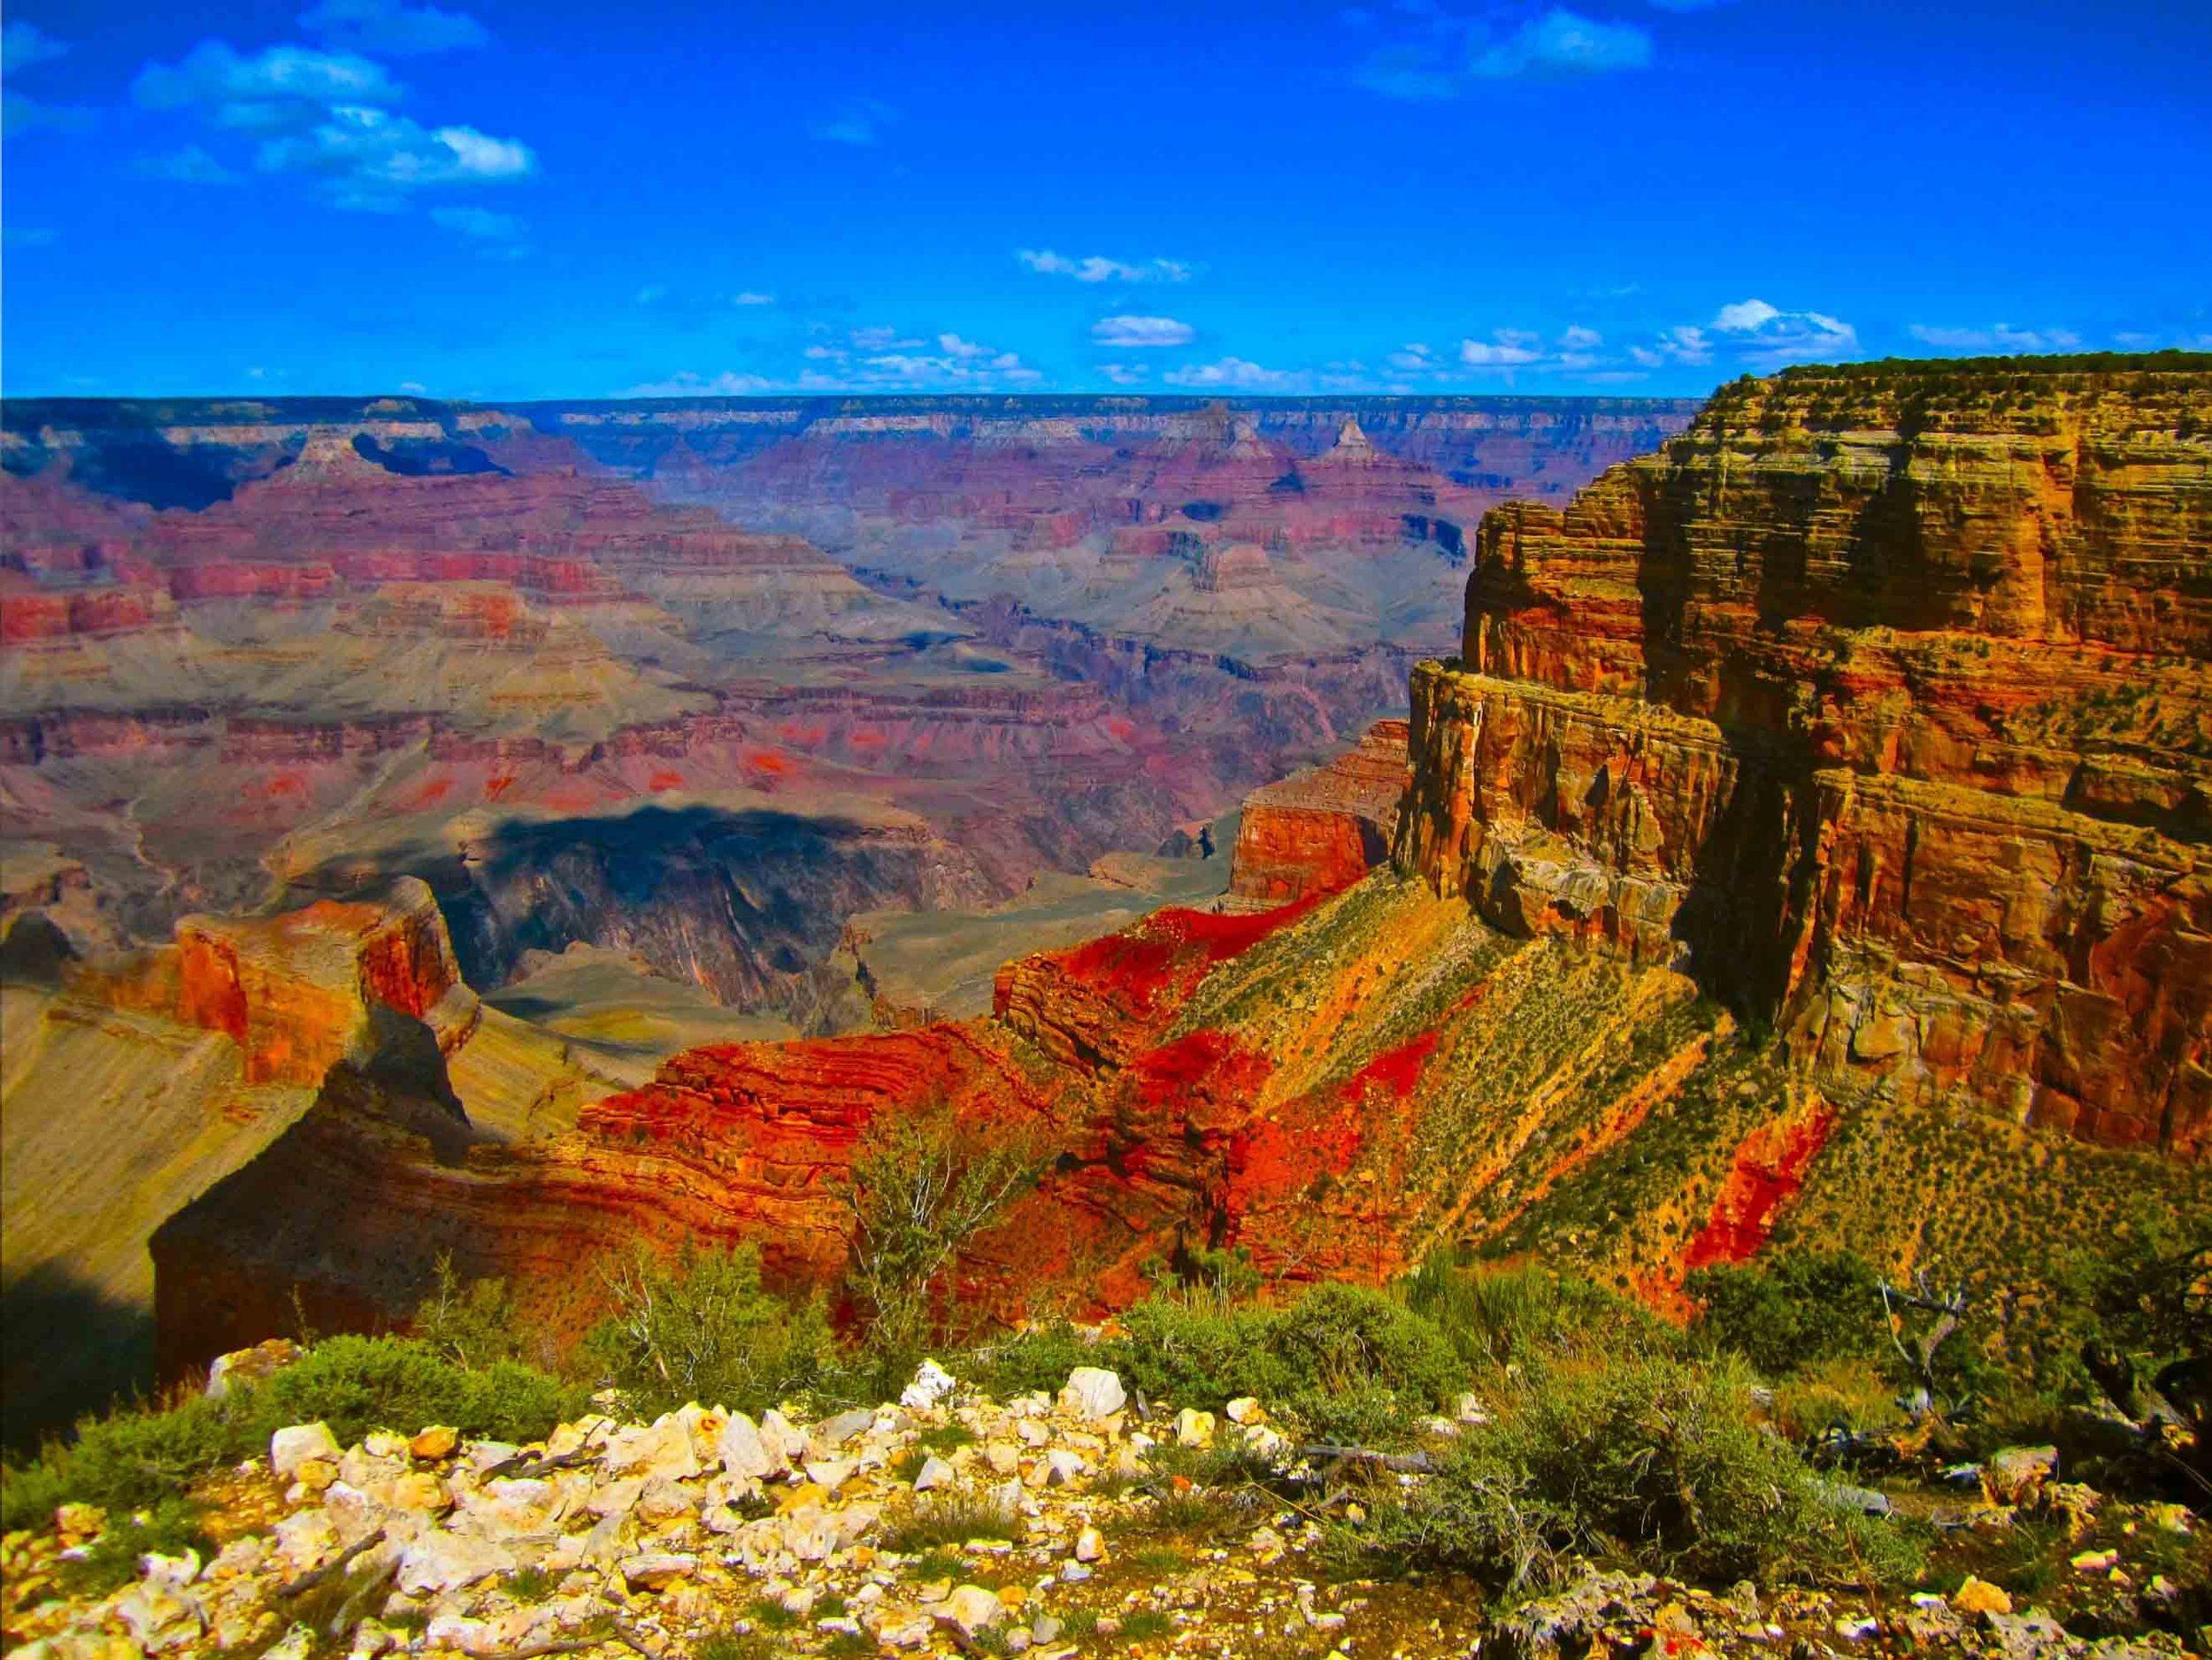 Grand Canyon, Arizona, April 2012